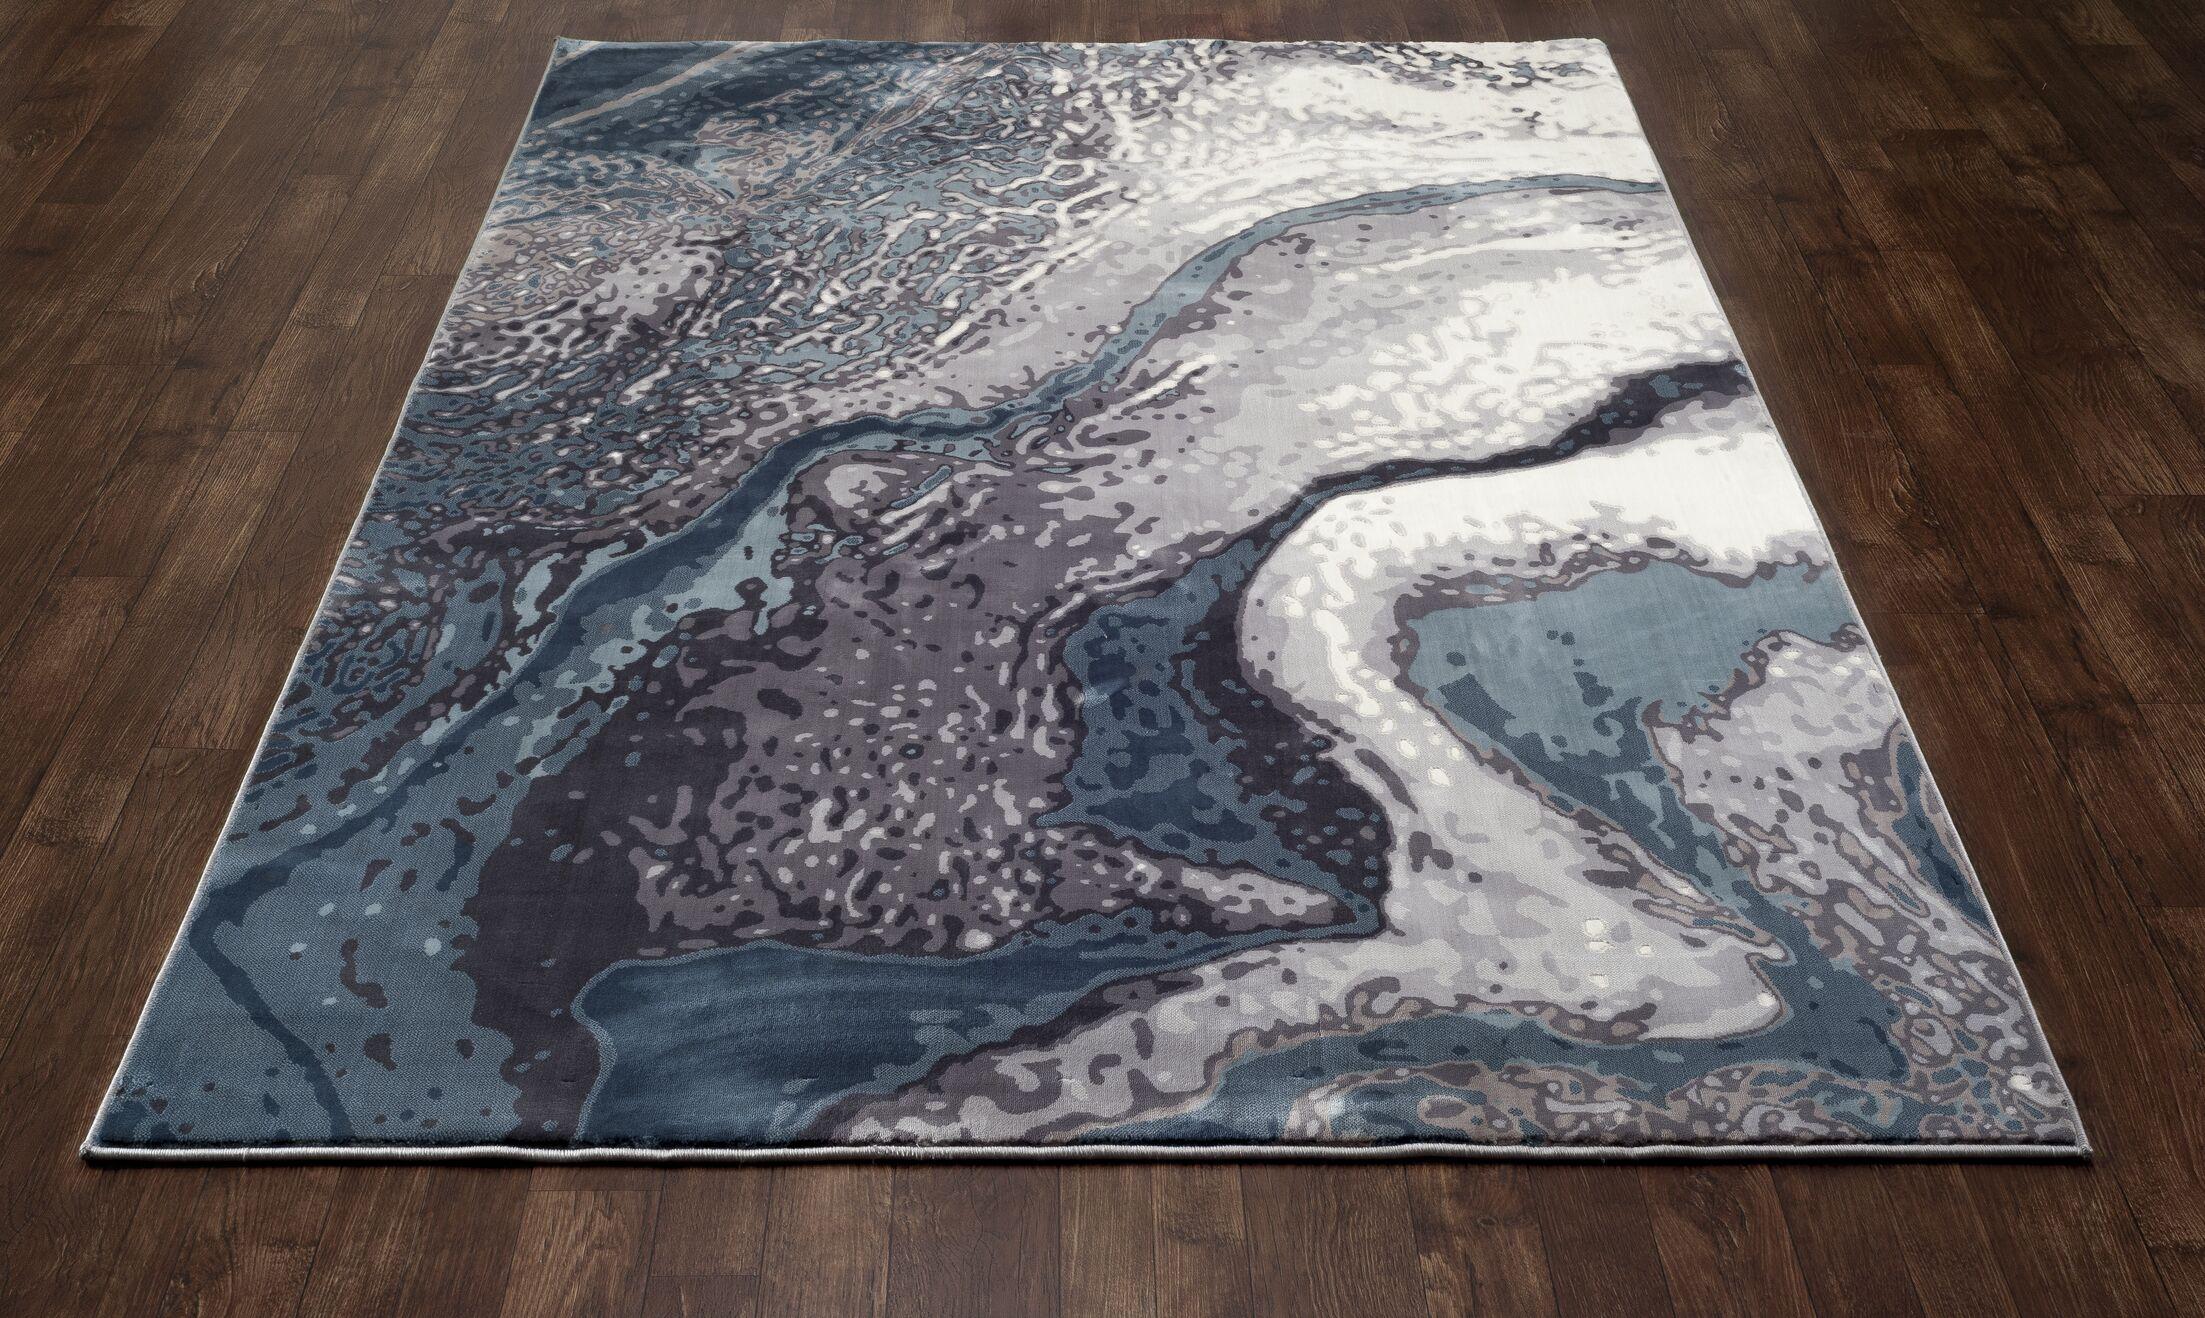 Mcconnell Aqua Blue/Cream Area Rug Rug Size: 2'2 x 3'7